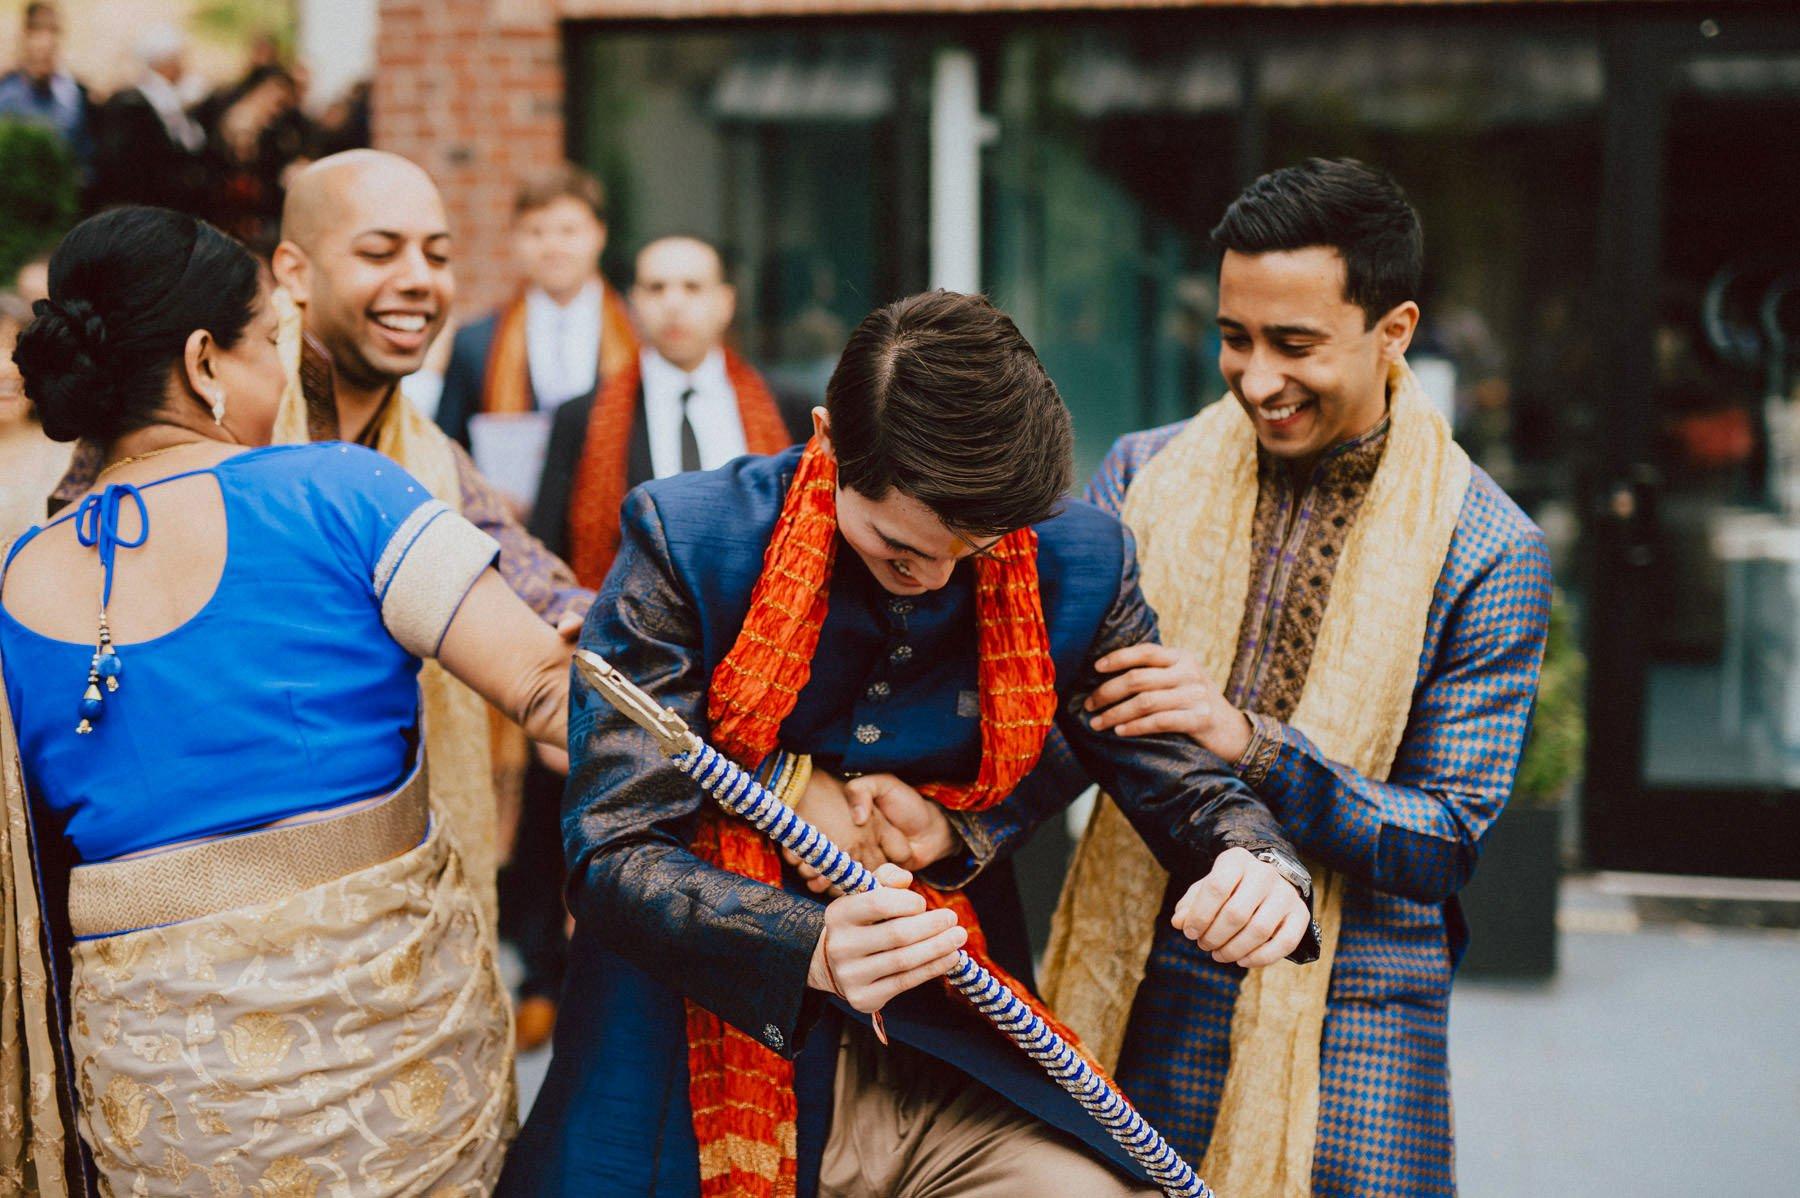 vie-philadelphia-indian-wedding-60.jpg